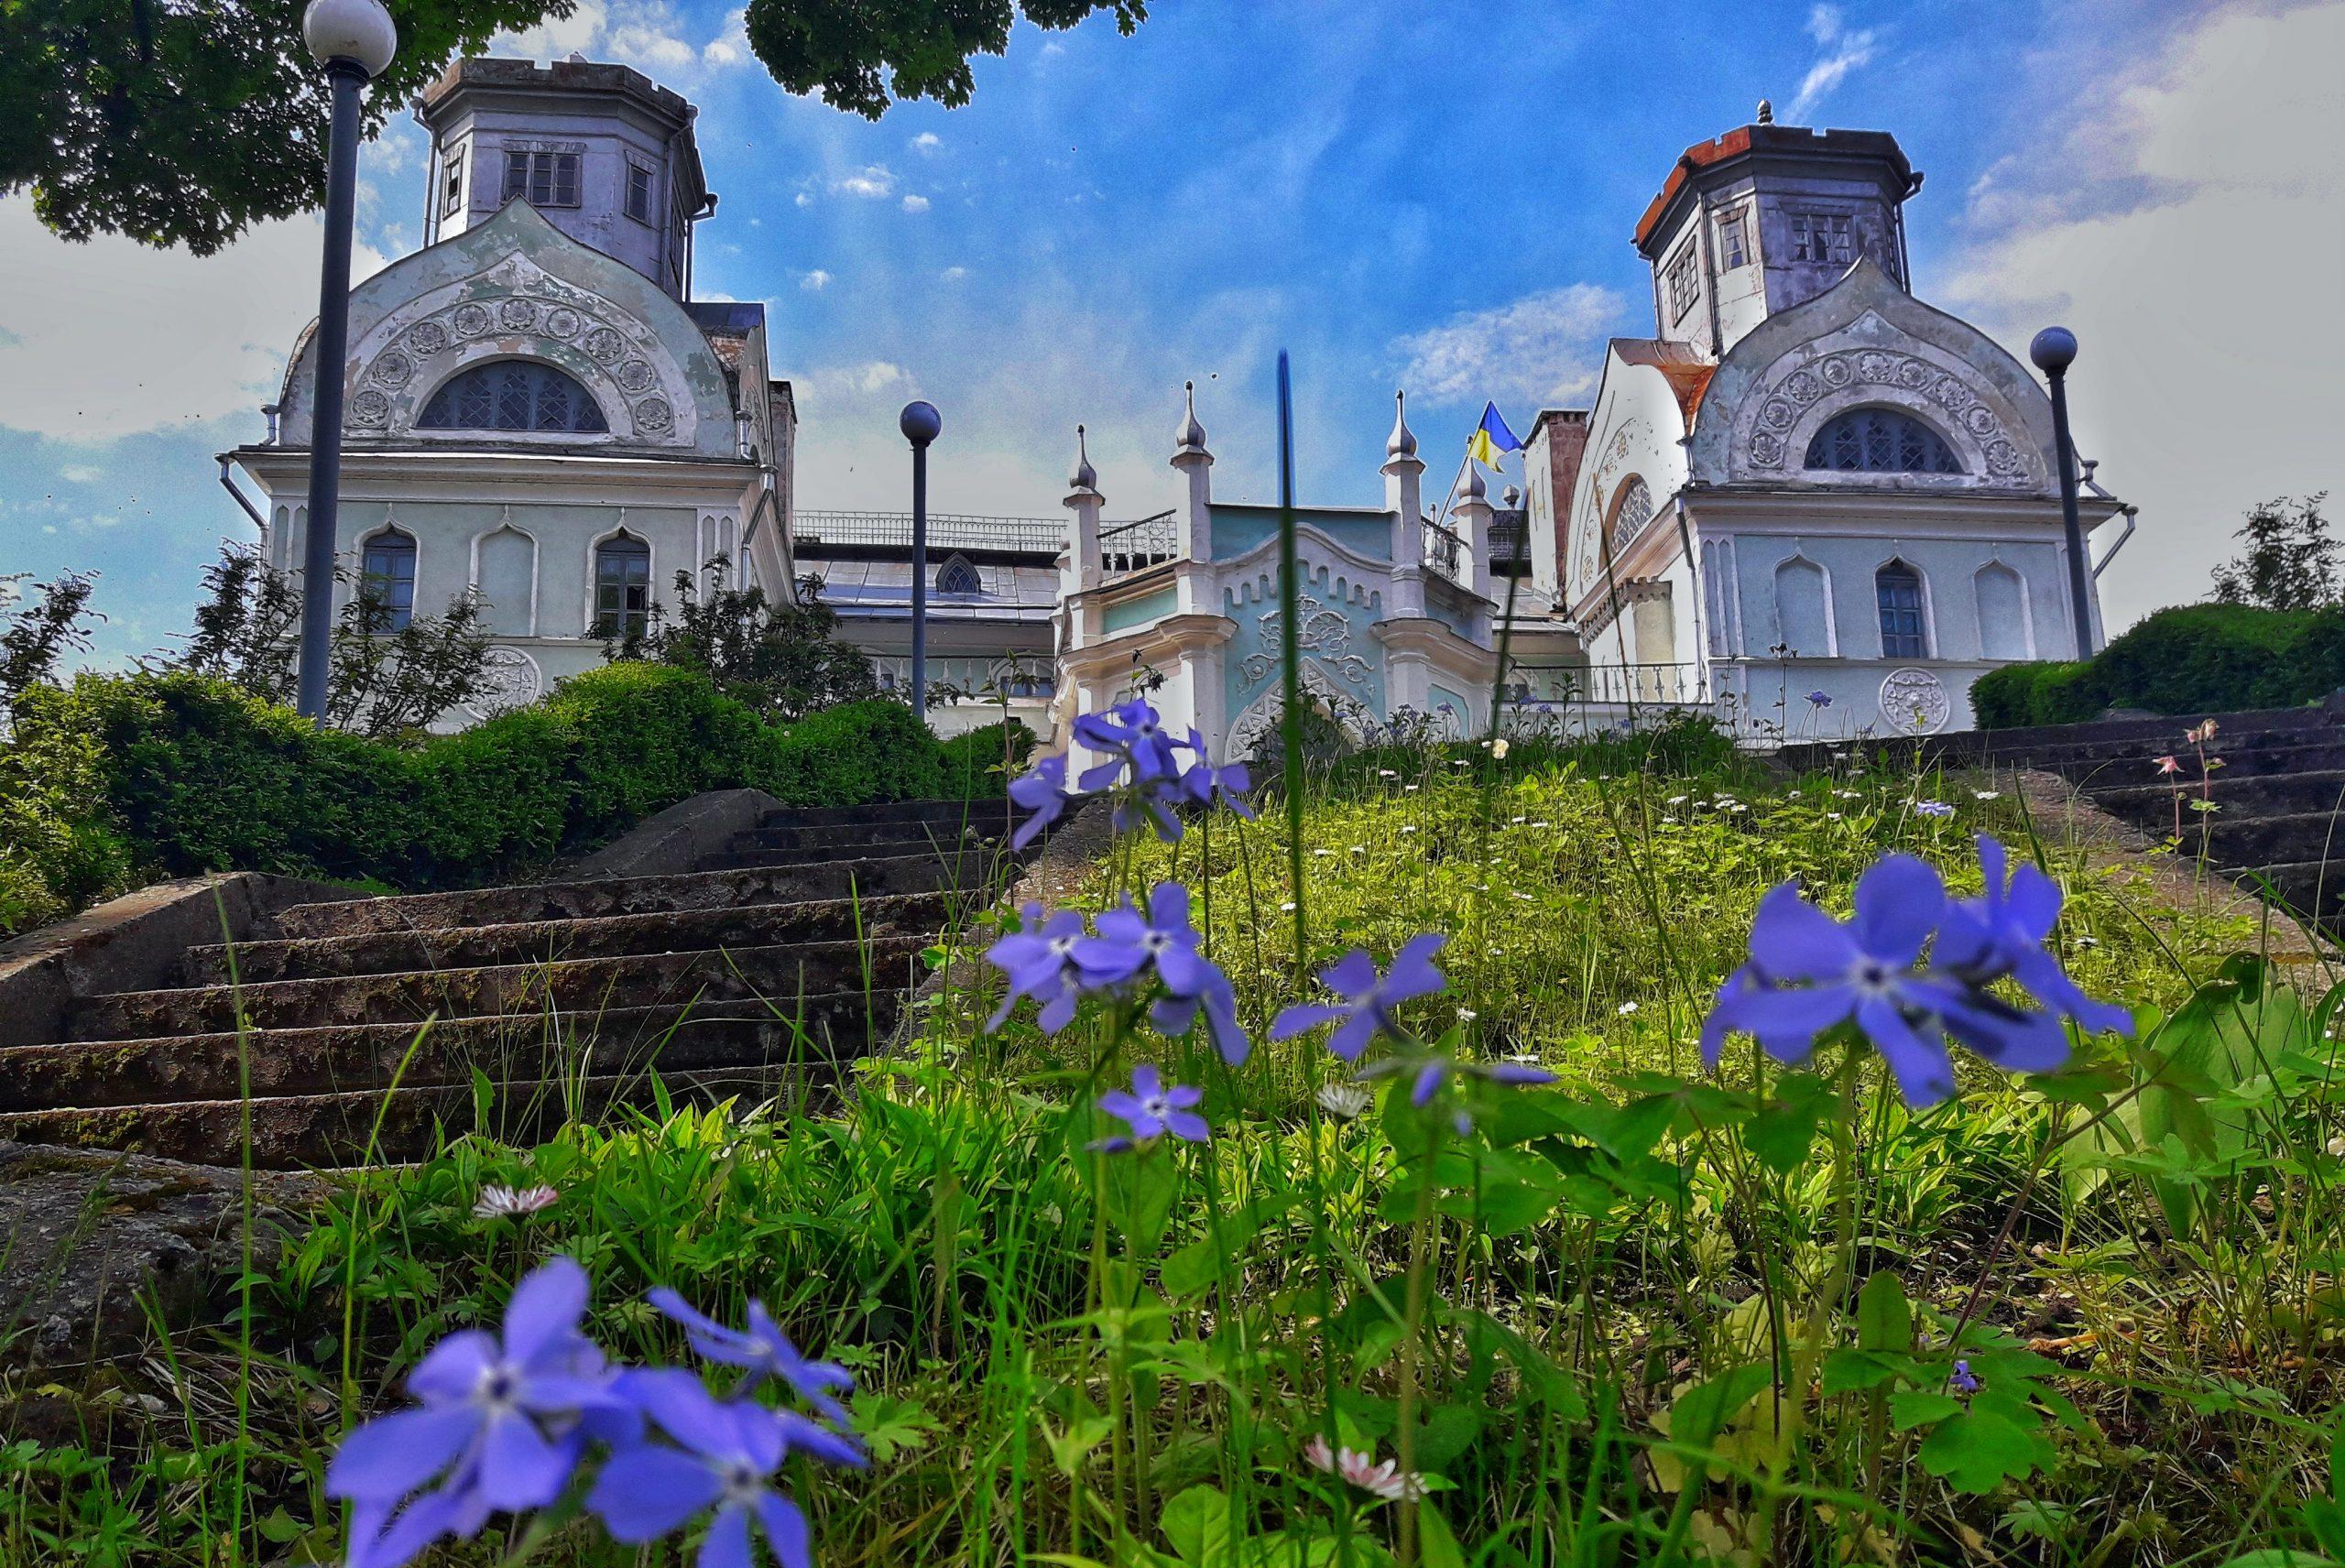 Palace. Photo by Oleksandr Proskurin